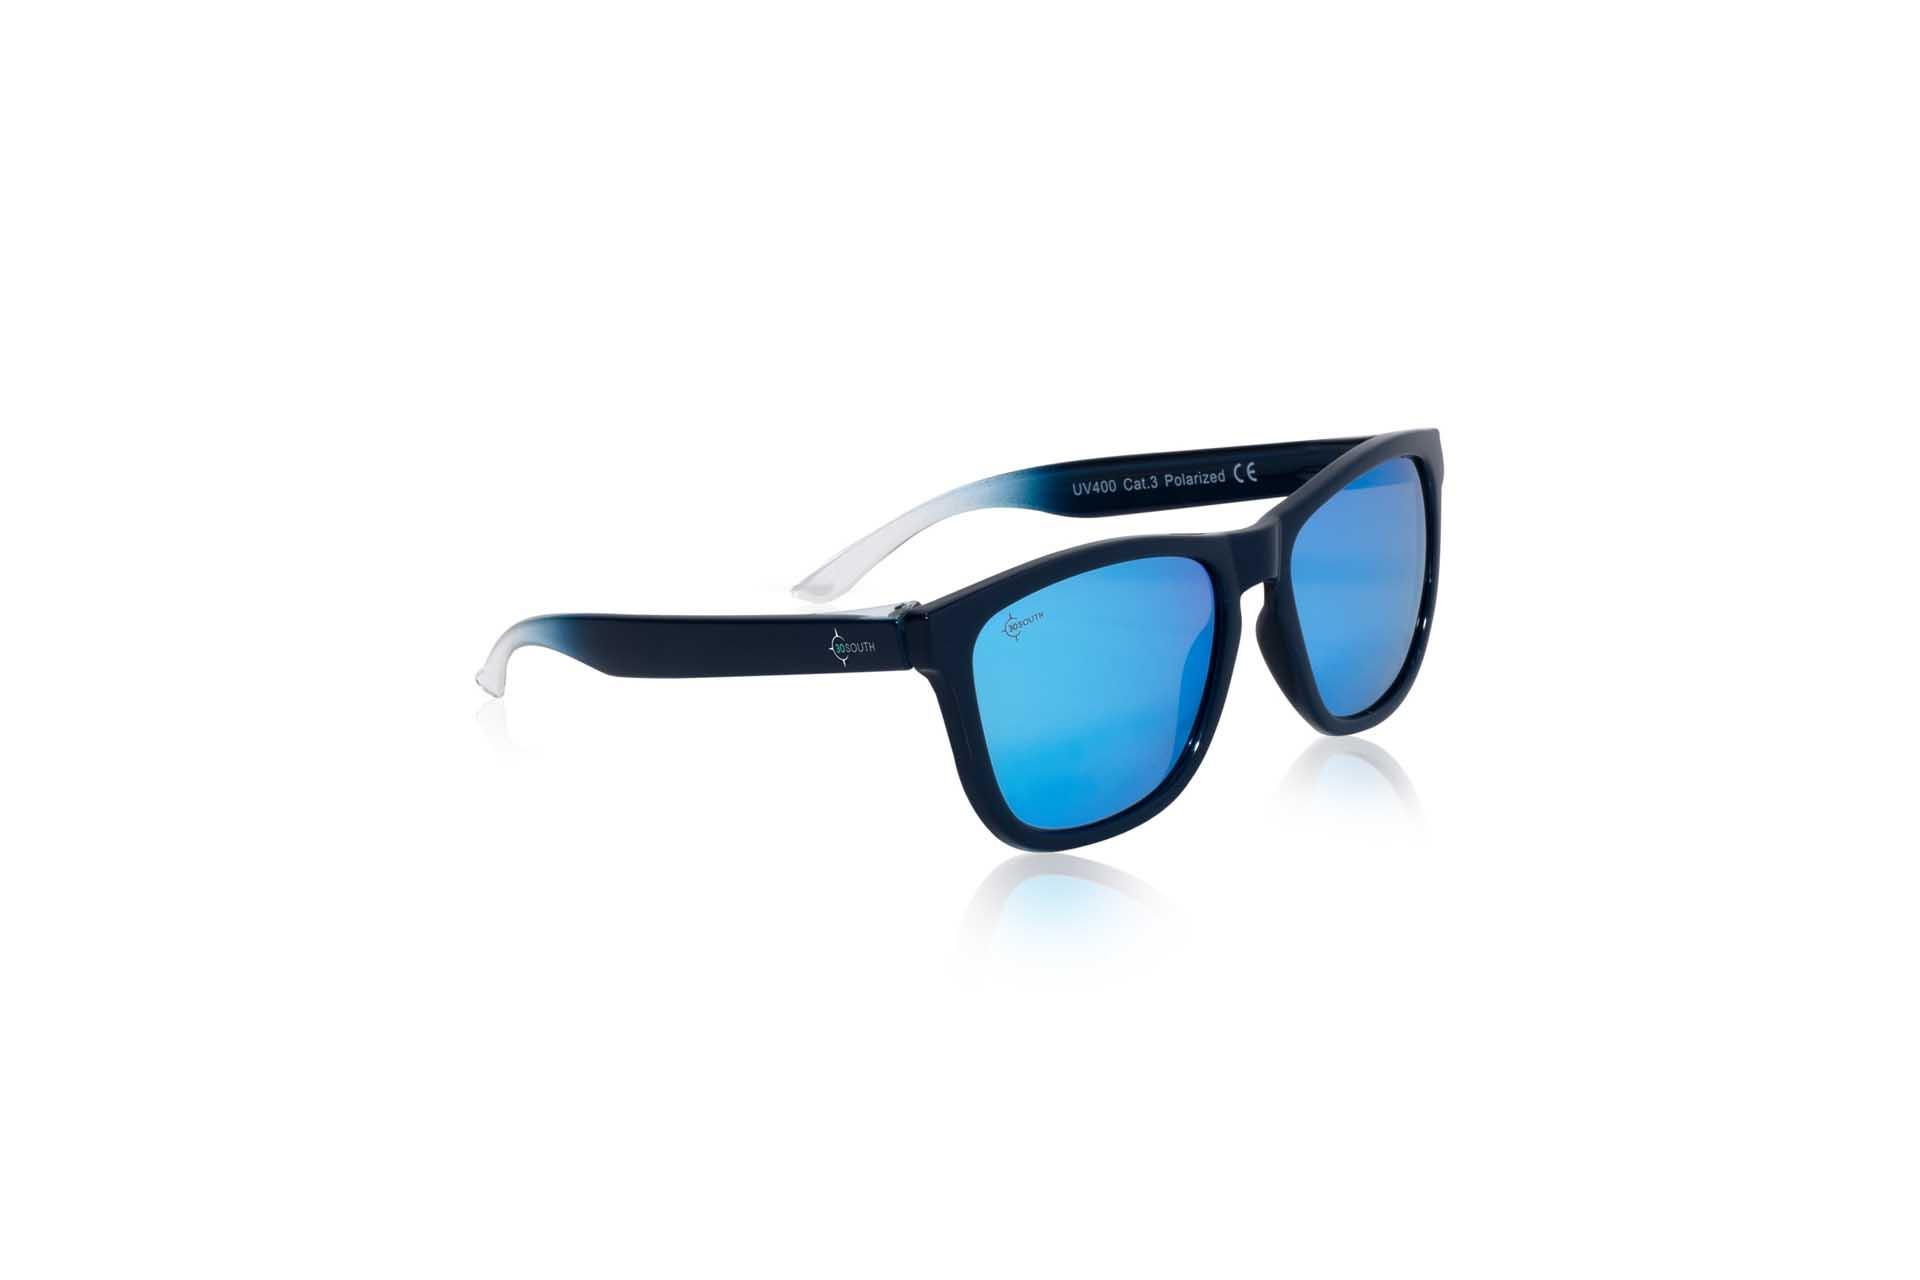 Photo of The JBays sunglasses